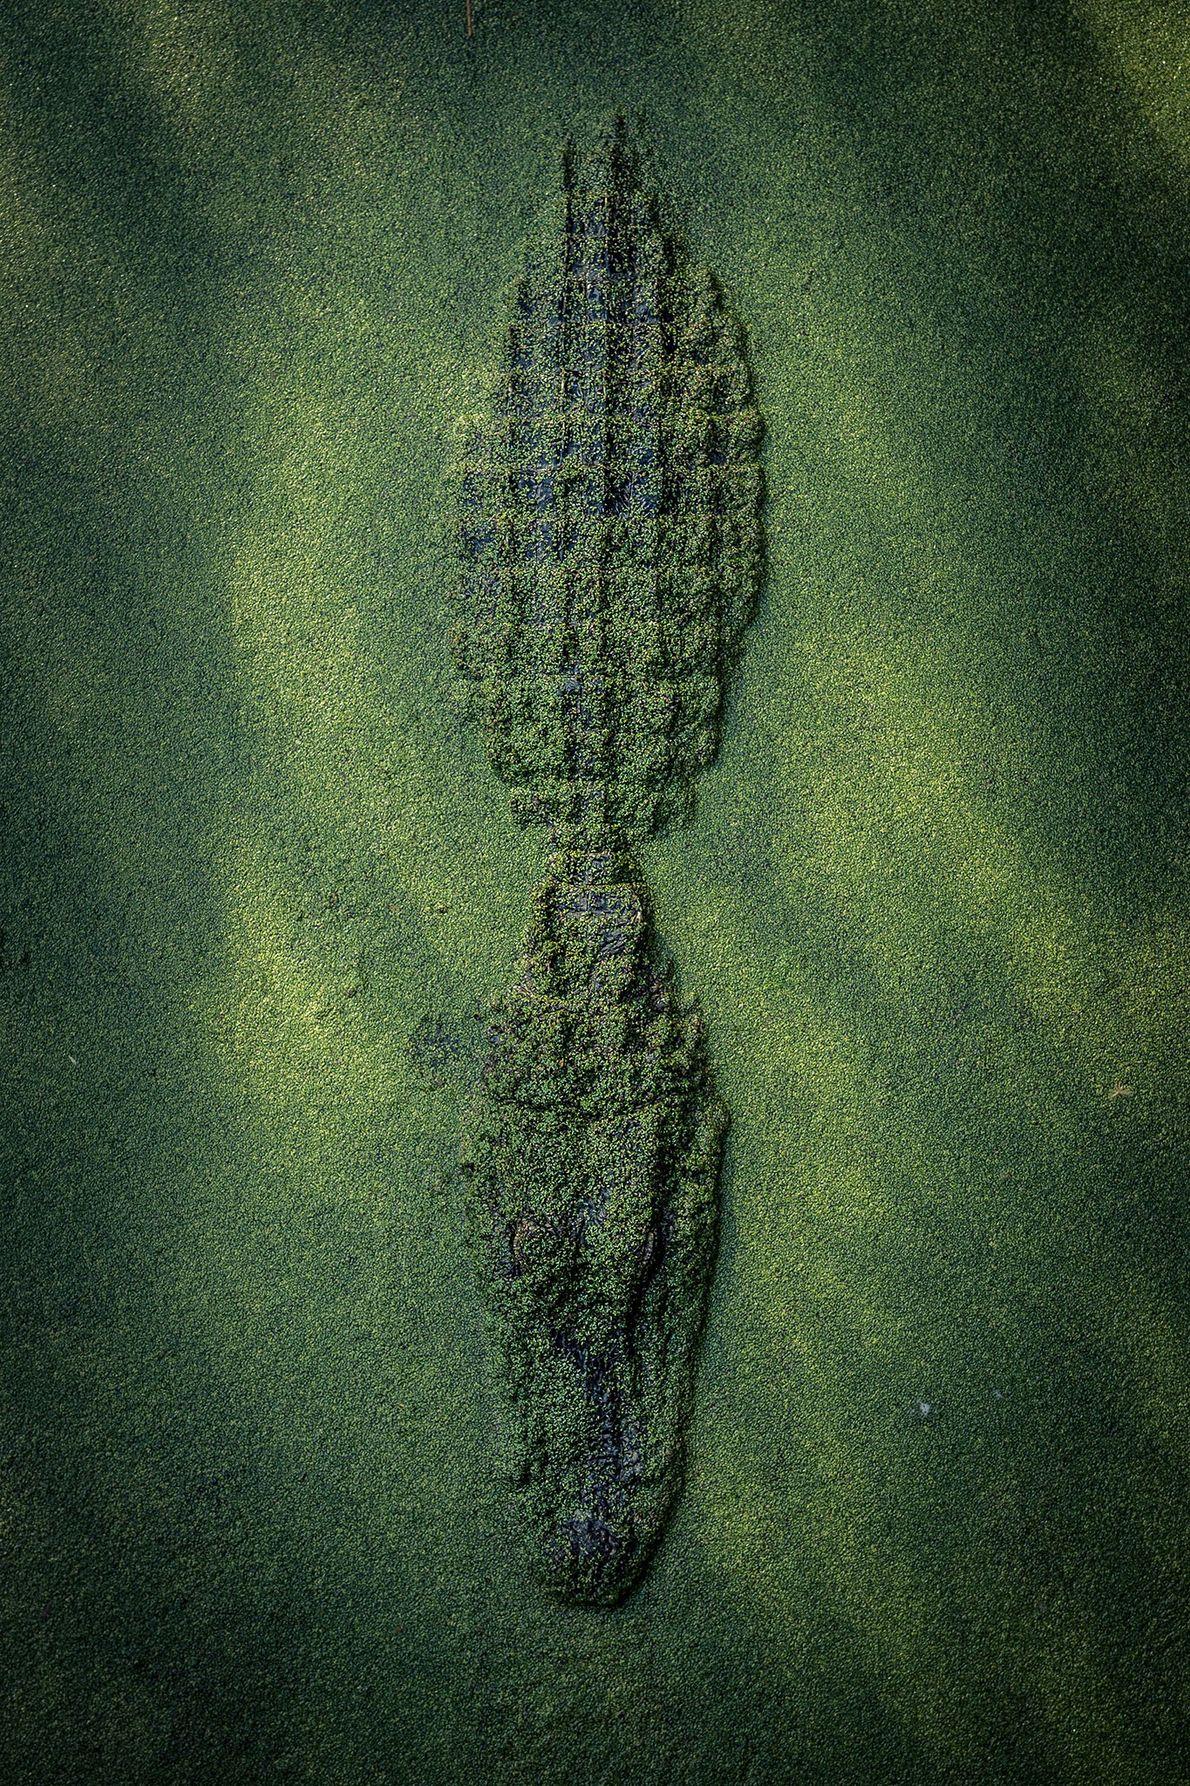 Alligator, New Orleans, Louisiana, United States.